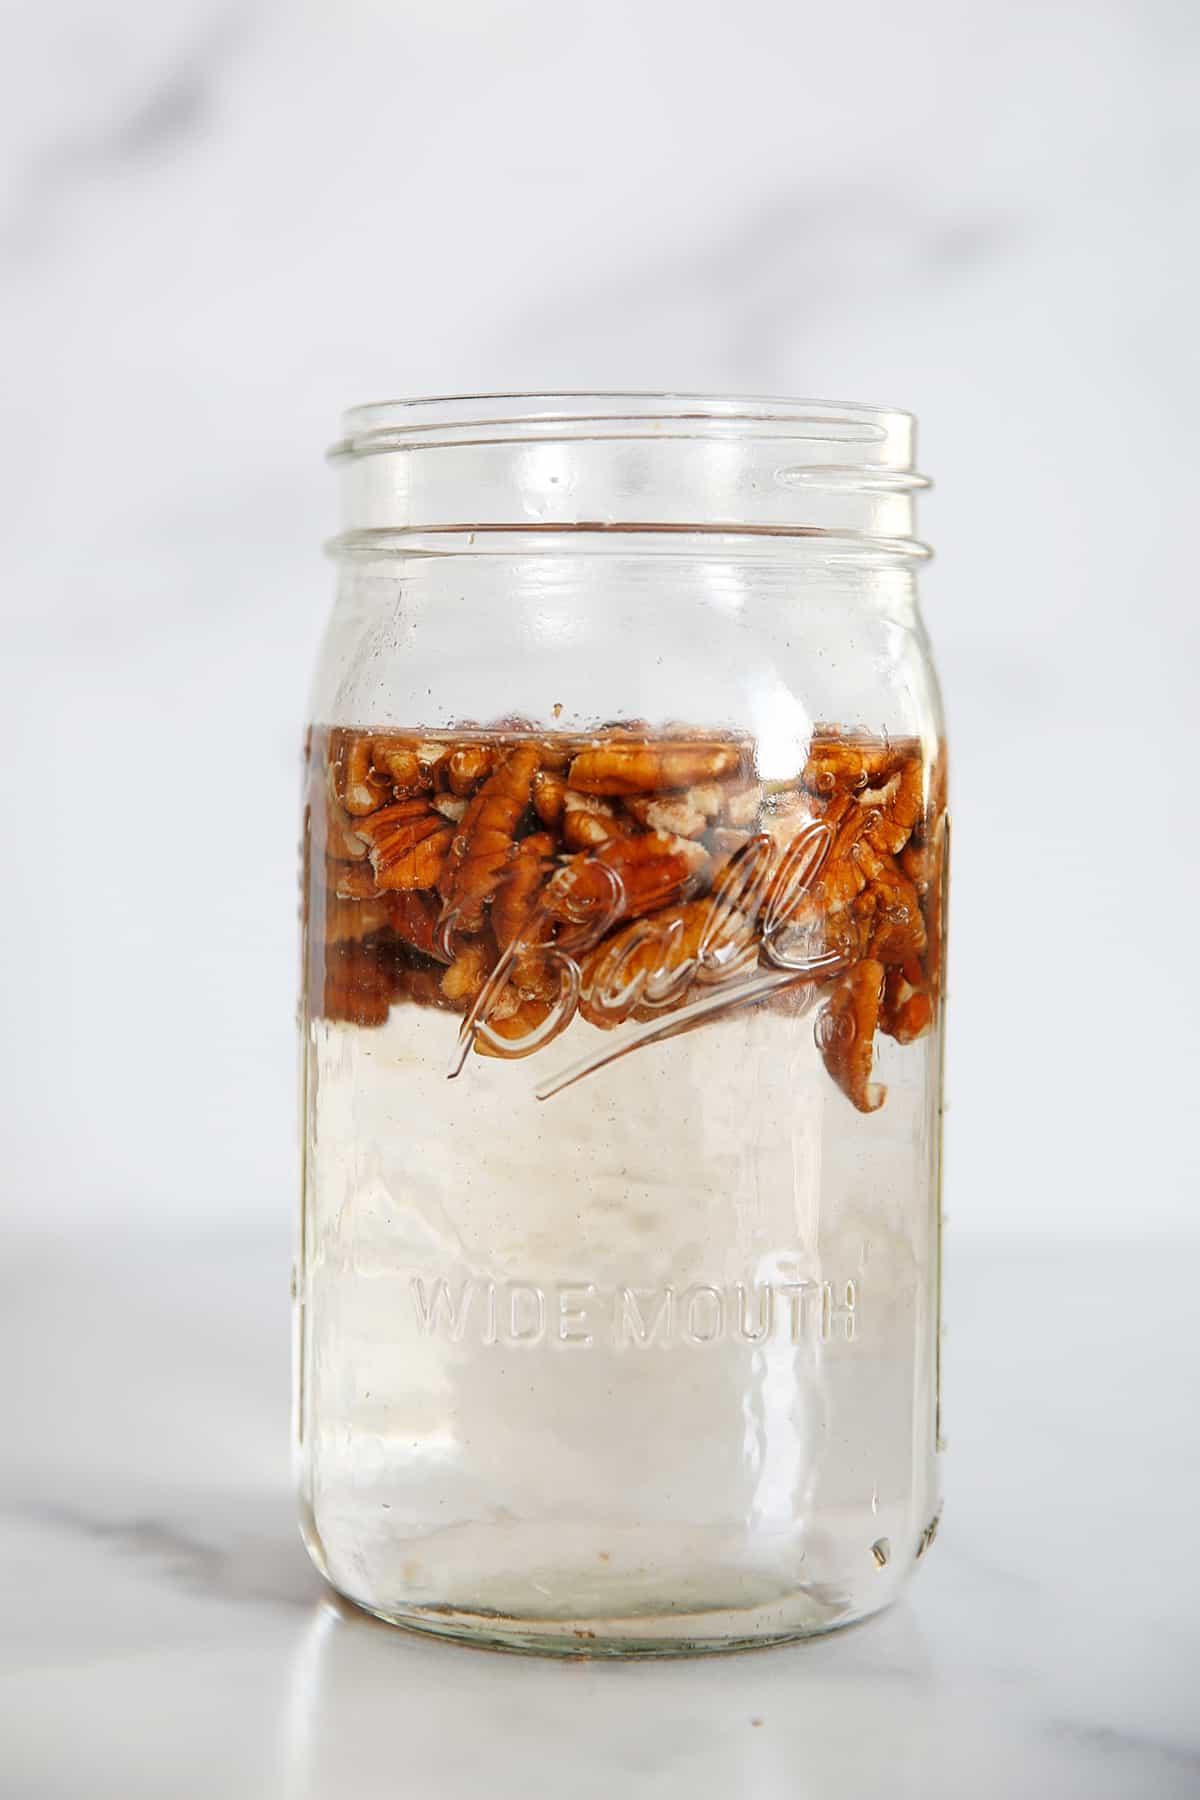 pecans soaking in a jar